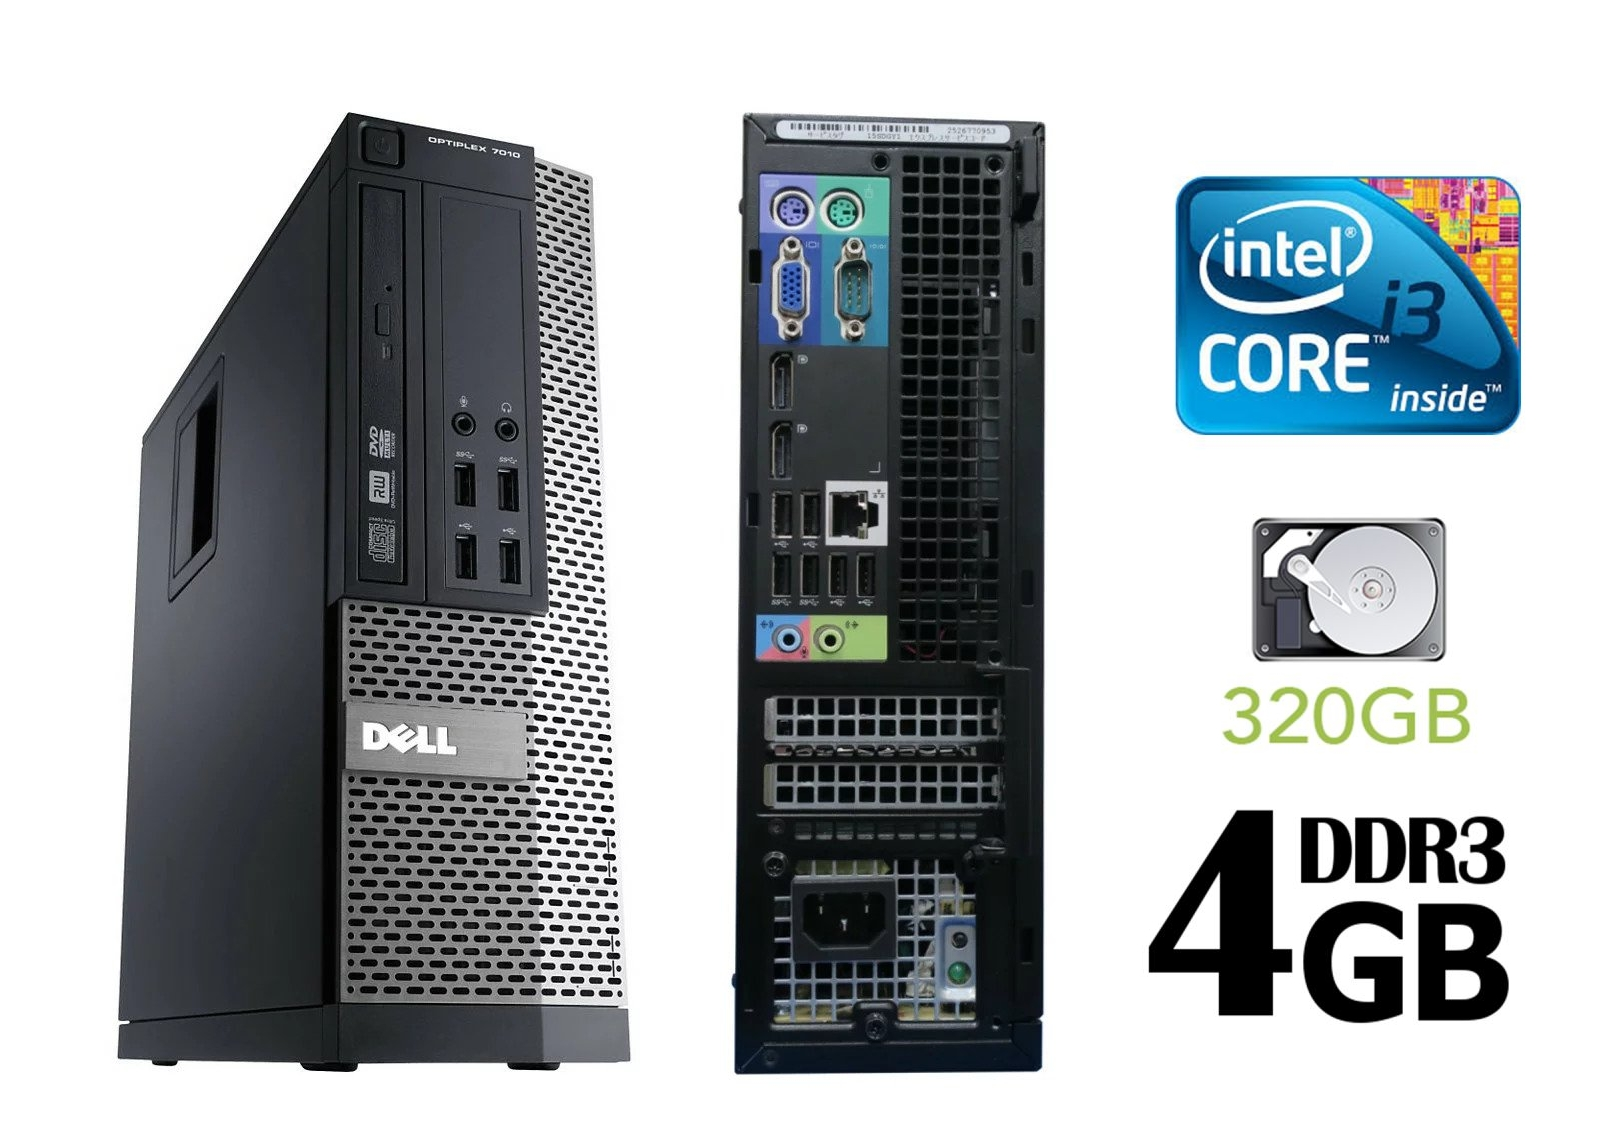 3.4 GHz Core  i3_4gb RAM_320GB Refurbished desktop  with 3 Games free